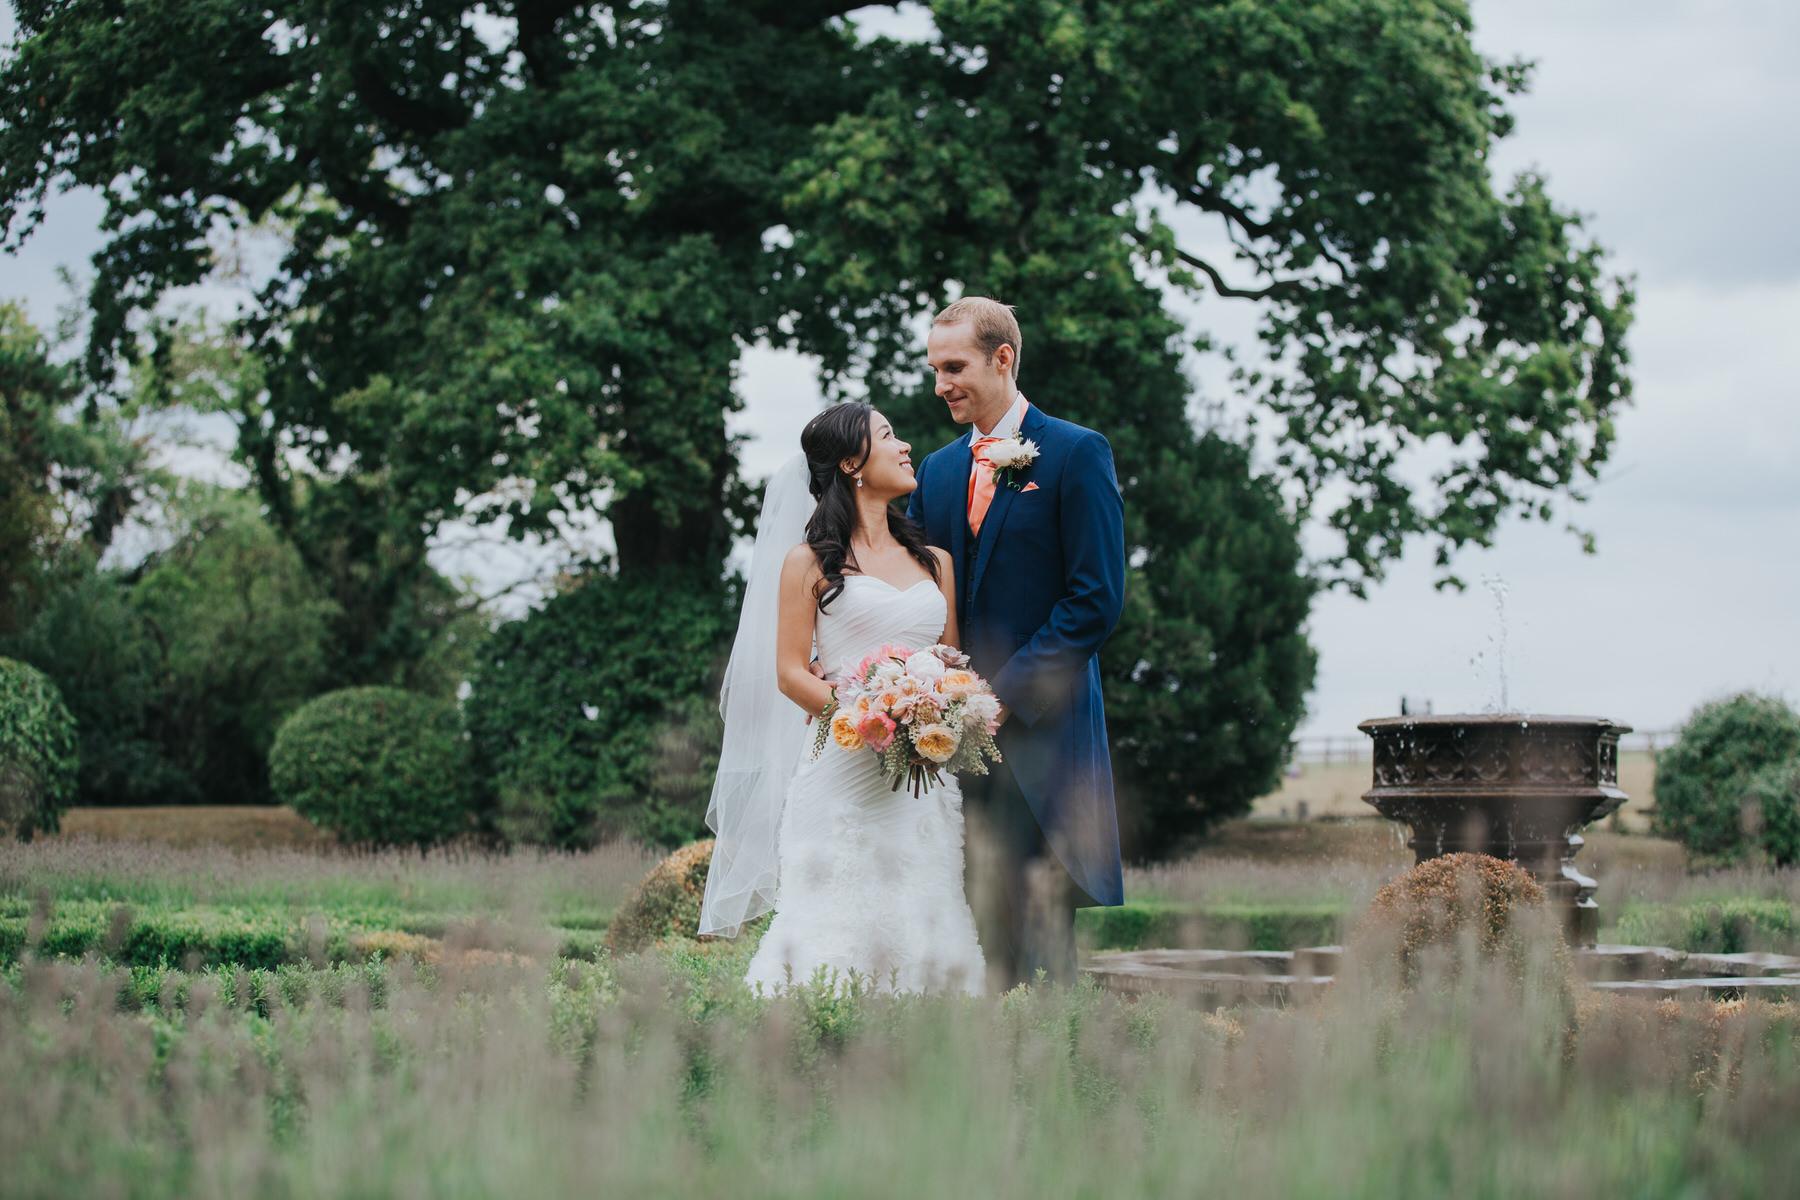 311 bride groom wedding portraits Woodlands Hotel photography.jpg